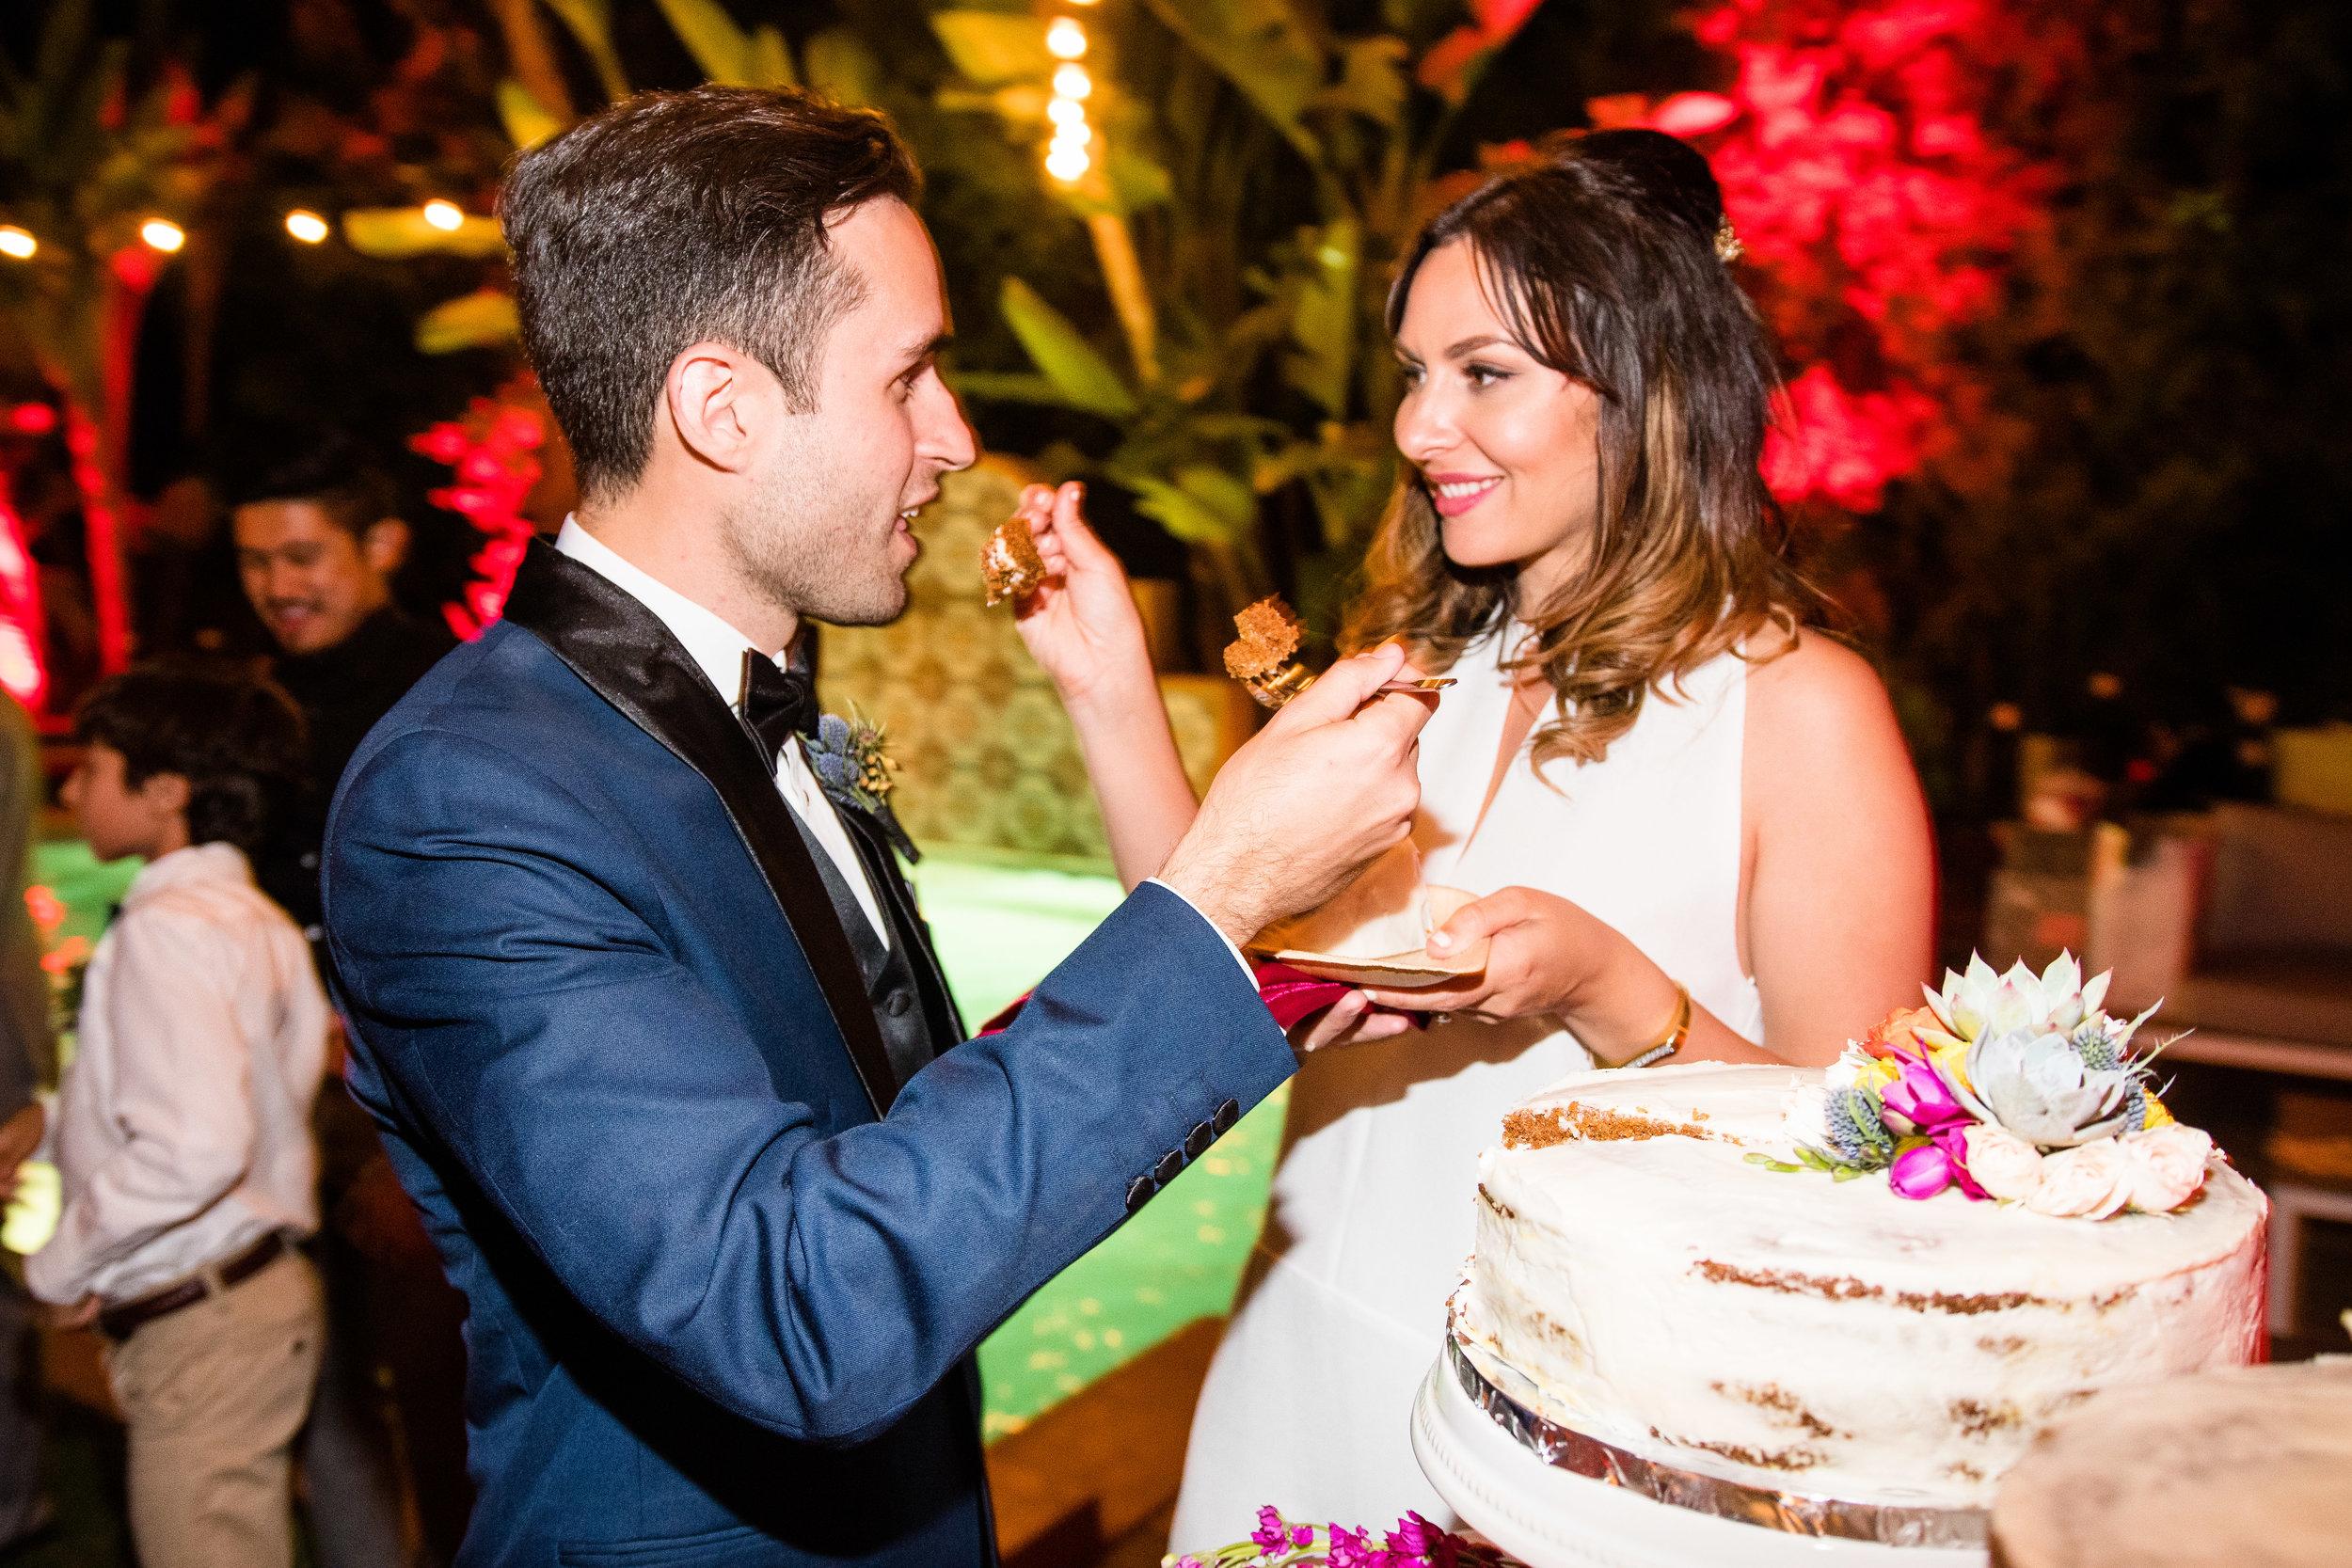 Vibrant Fiesta Backyard Wedding Reception bride and groom feeding eachother cake.jpg